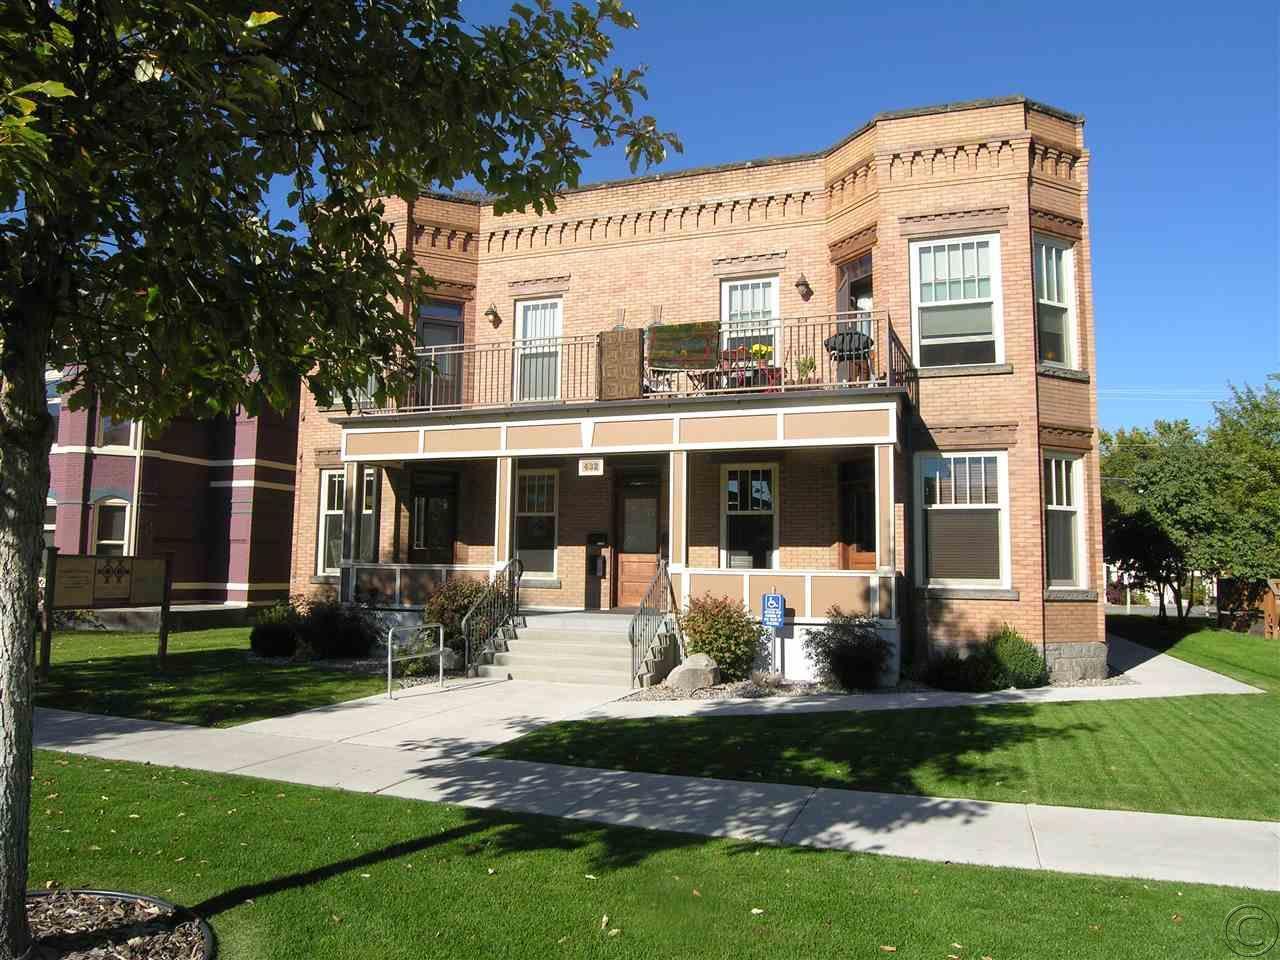 432 West Spruce Street, #201, Missoula, MT 59802